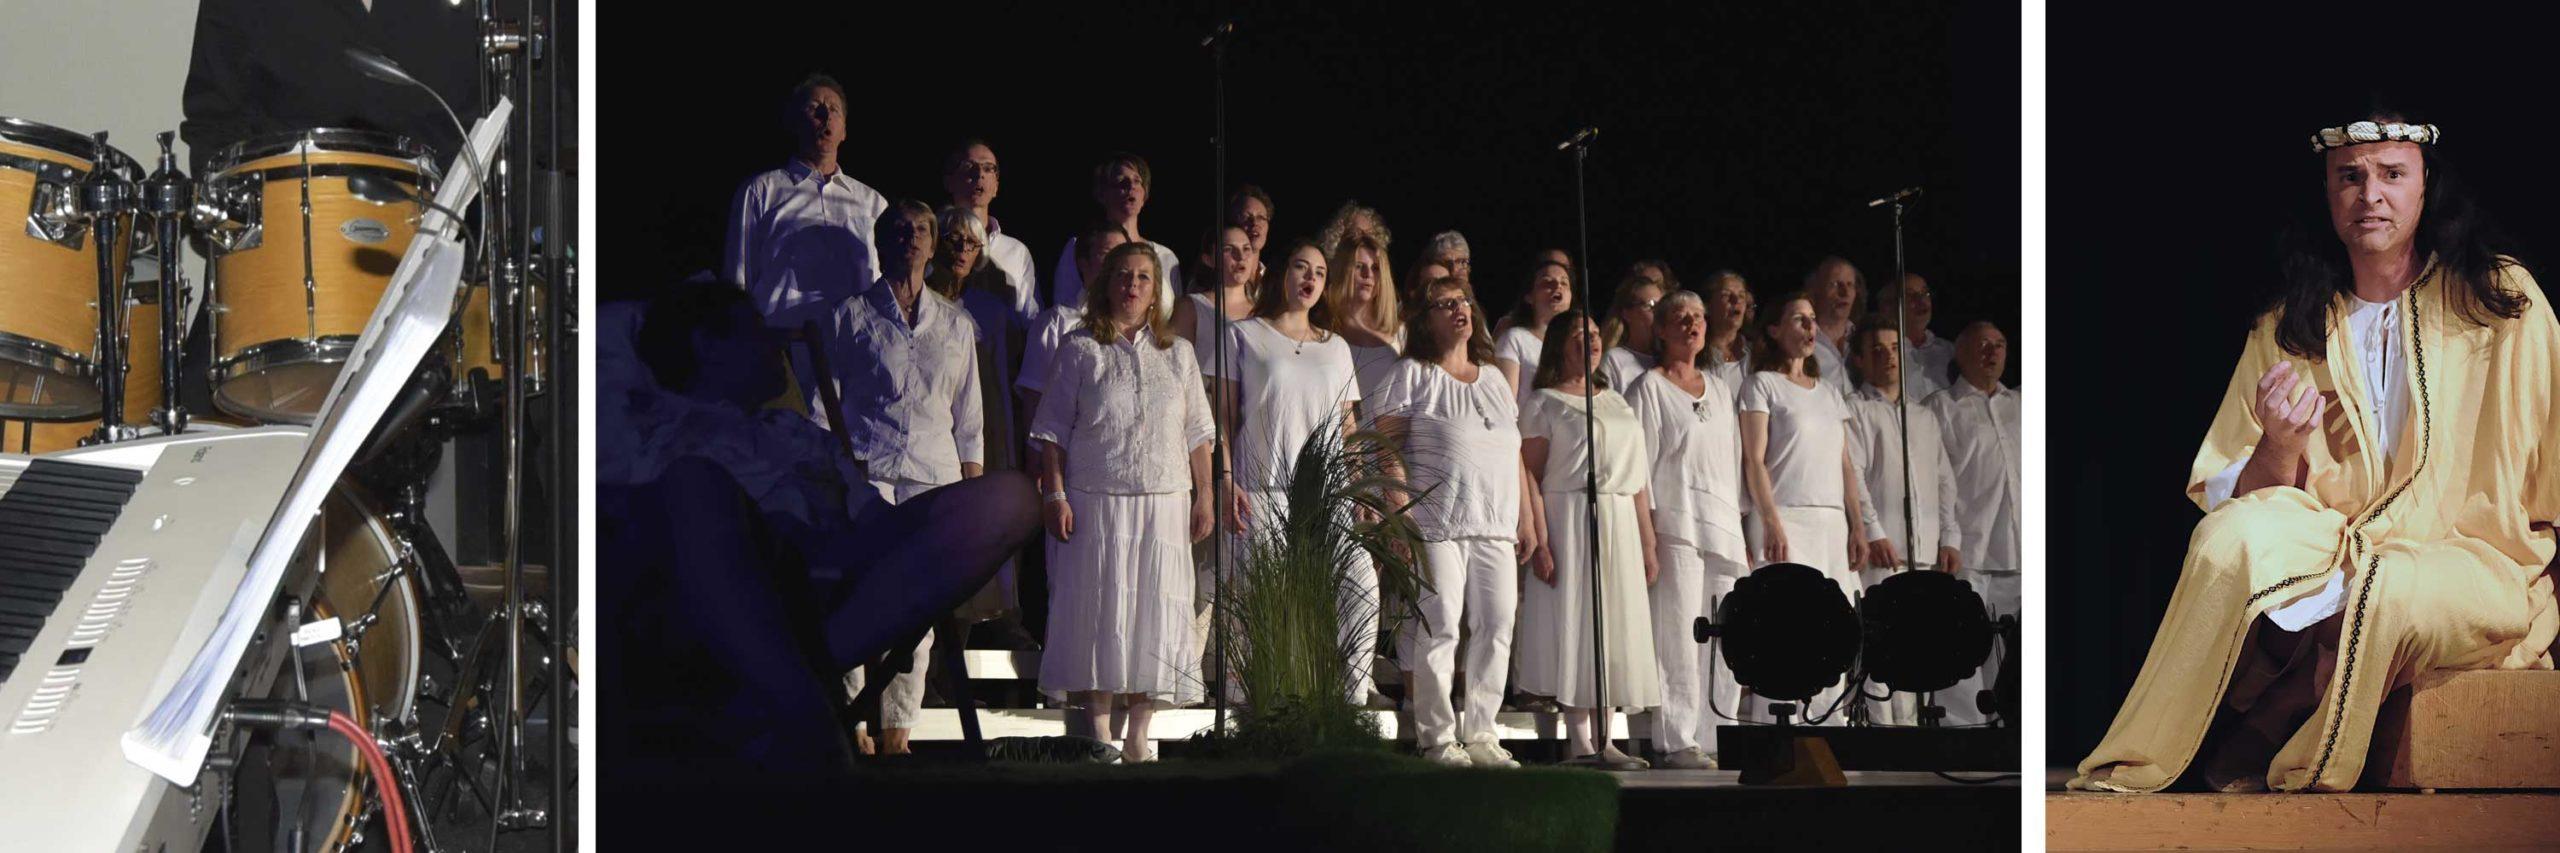 Musical - Stiftung Adliswiler Jugend